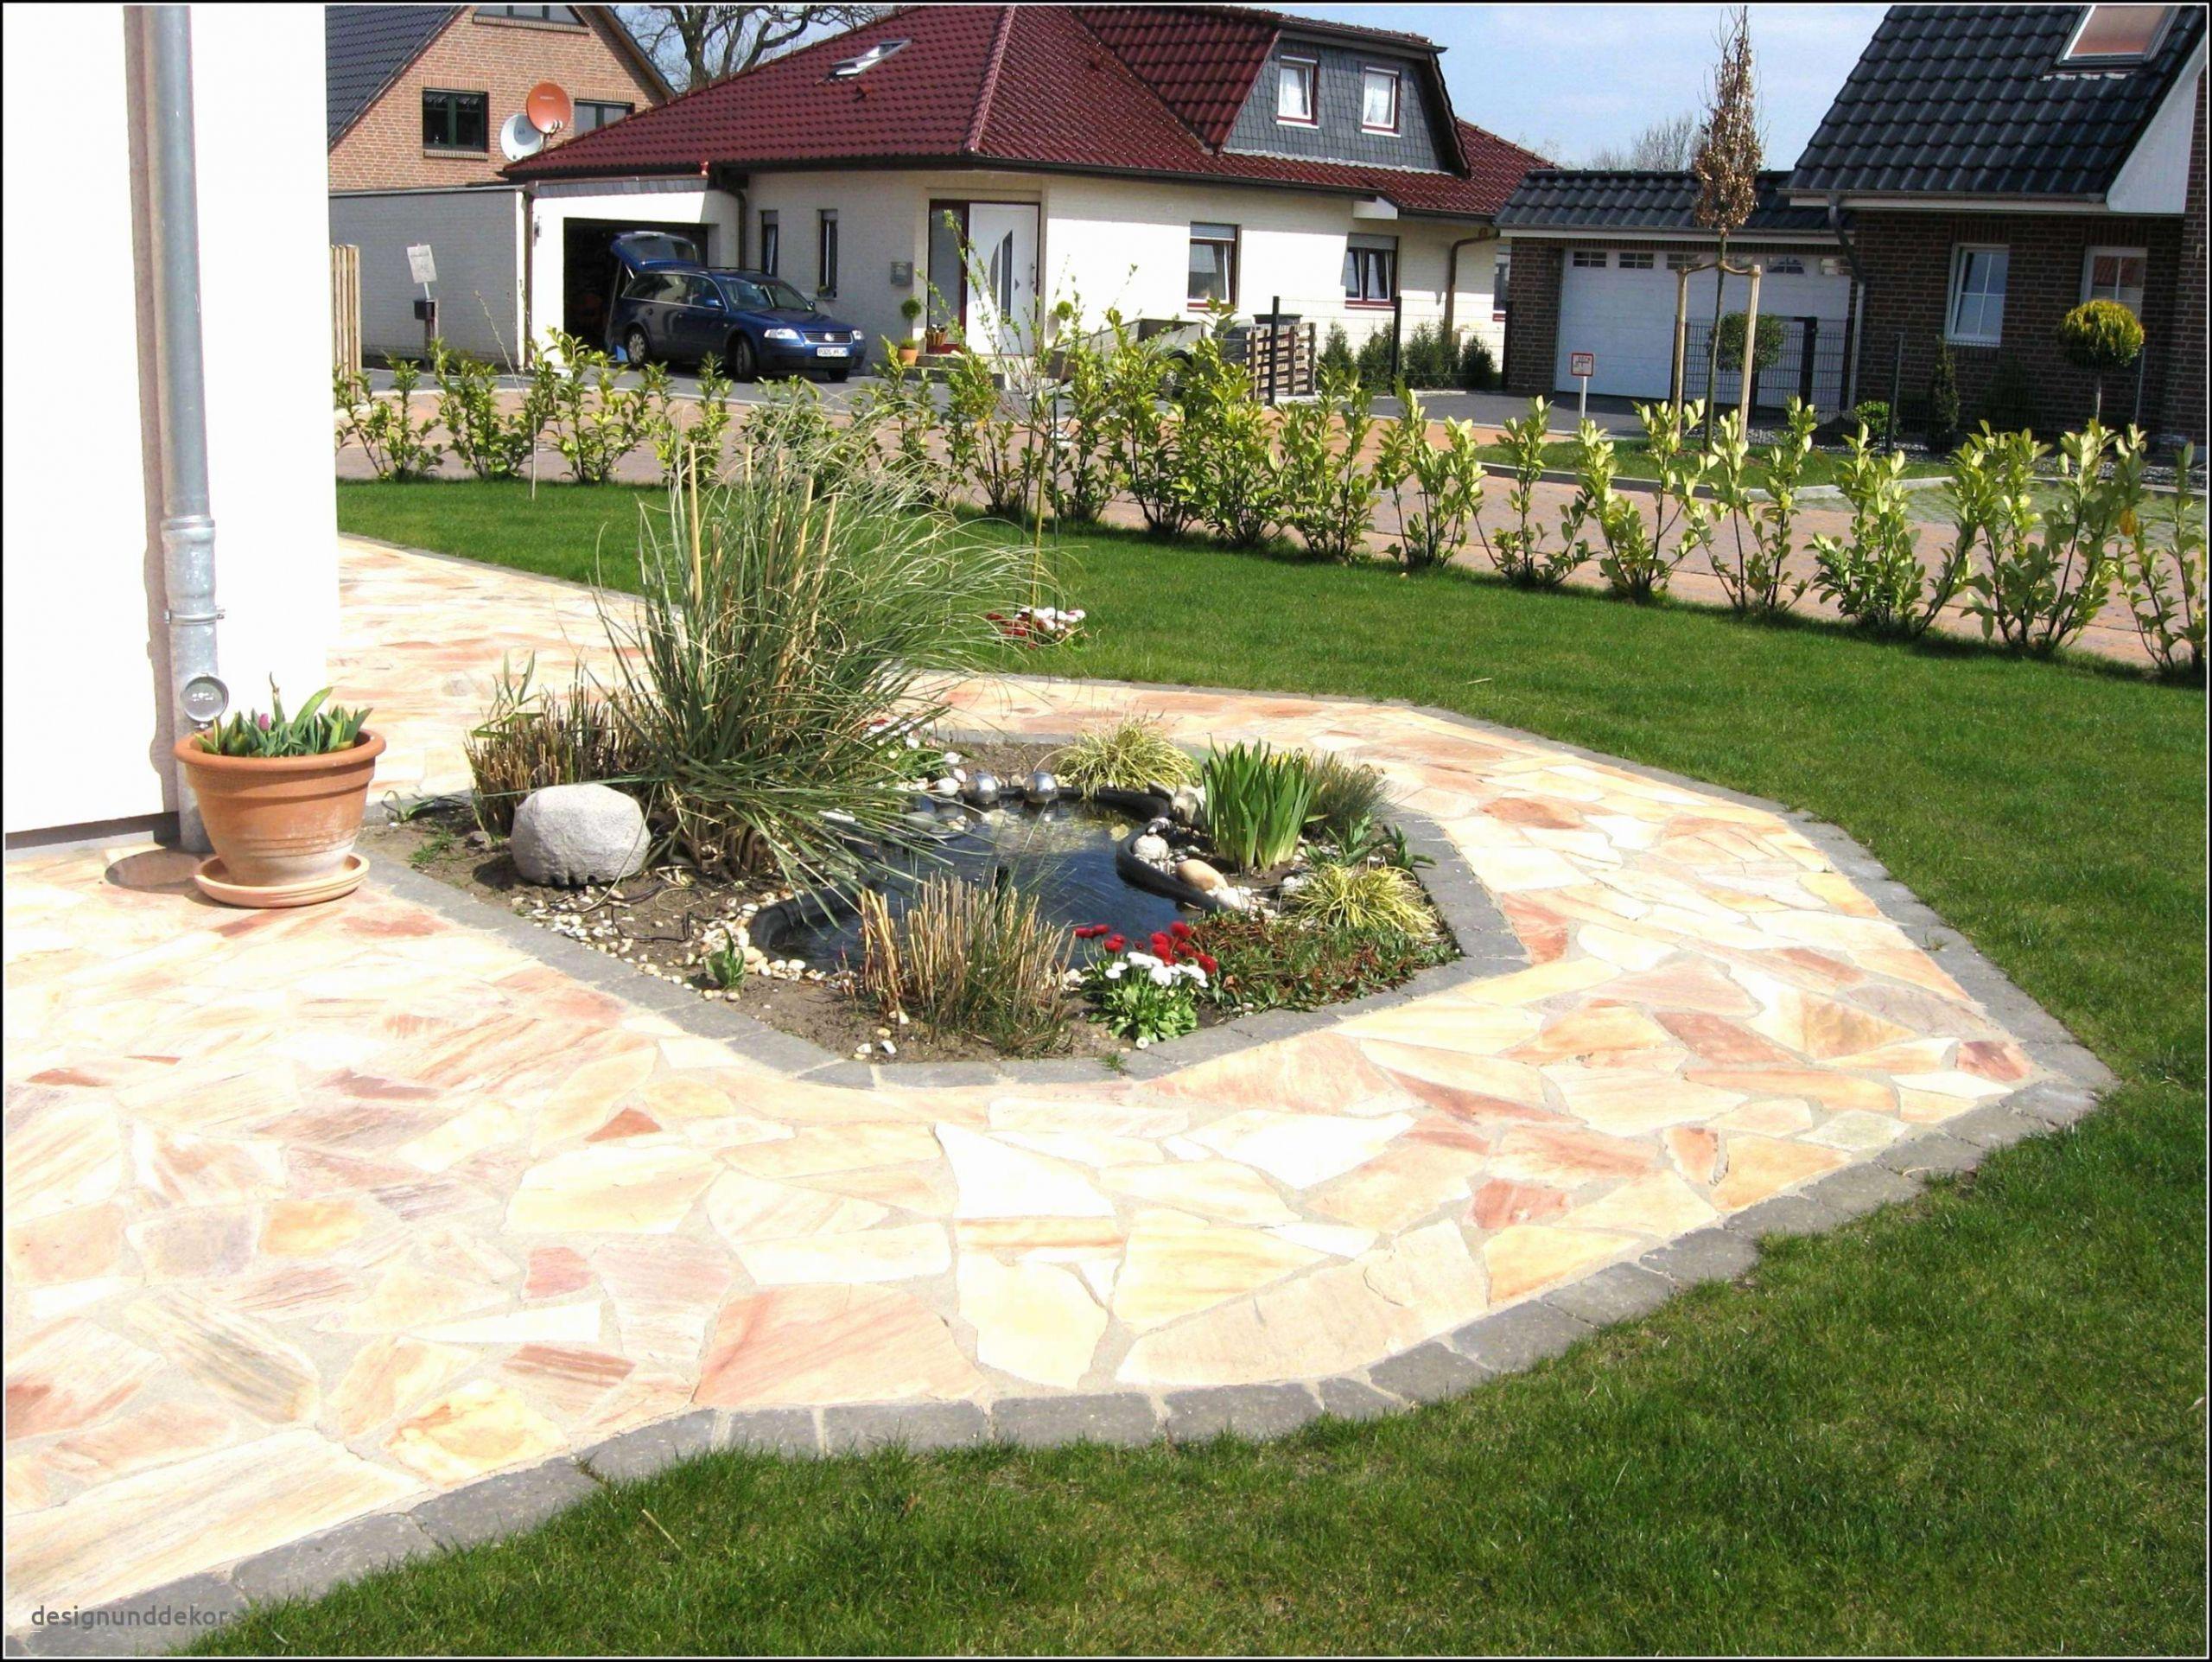 Asiatische Gartendeko Inspirierend Gartengestaltung Ideen Bilder — Temobardz Home Blog